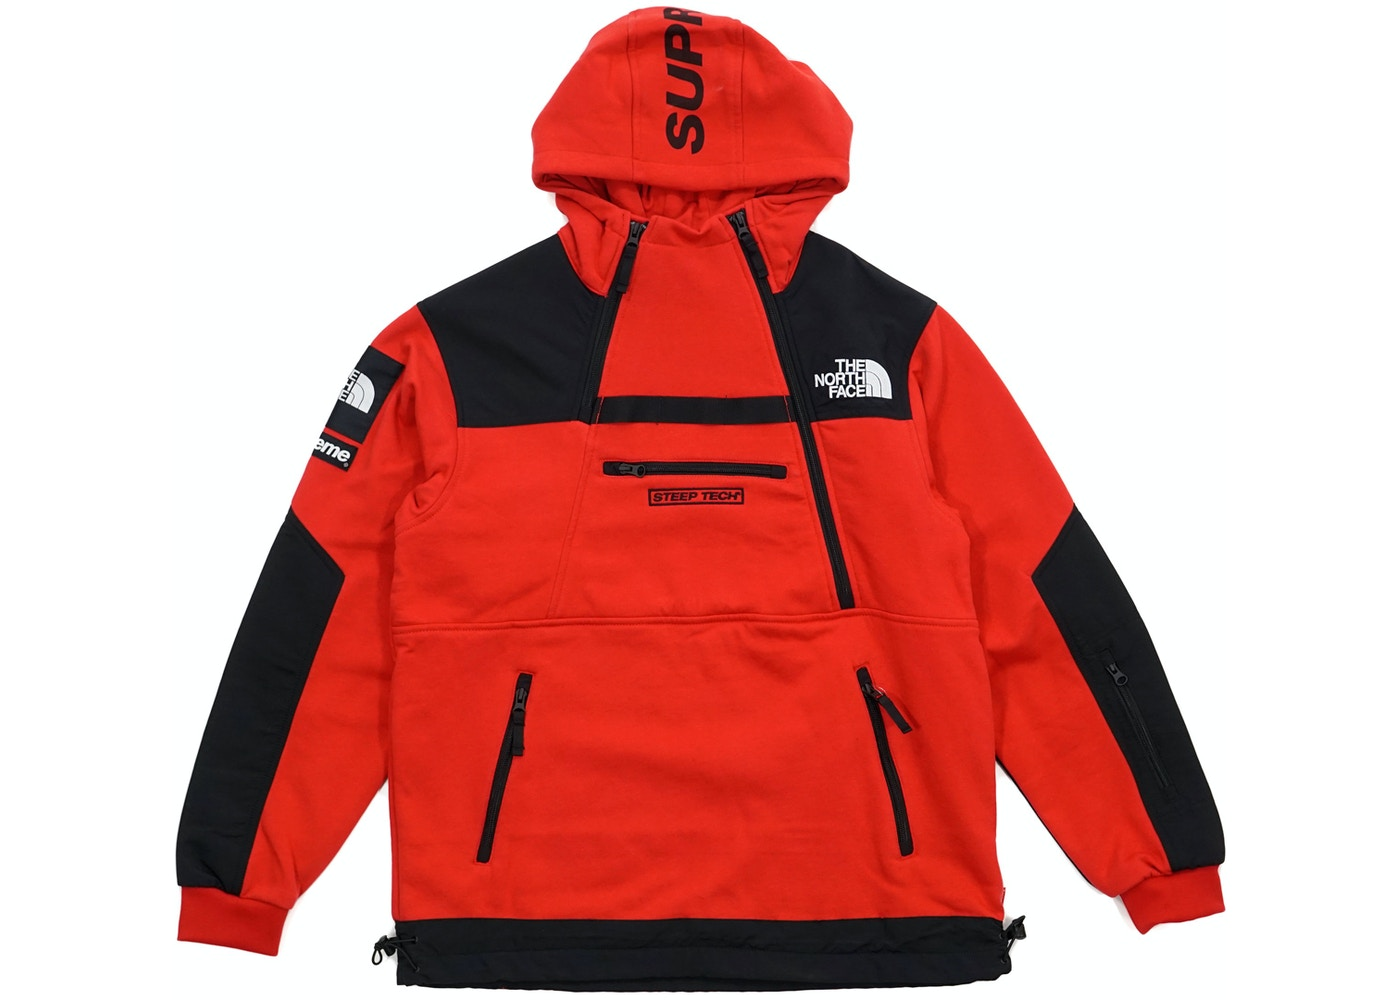 2e1142e9f Supreme The North Face Steep Tech Hooded Sweatshirt Red